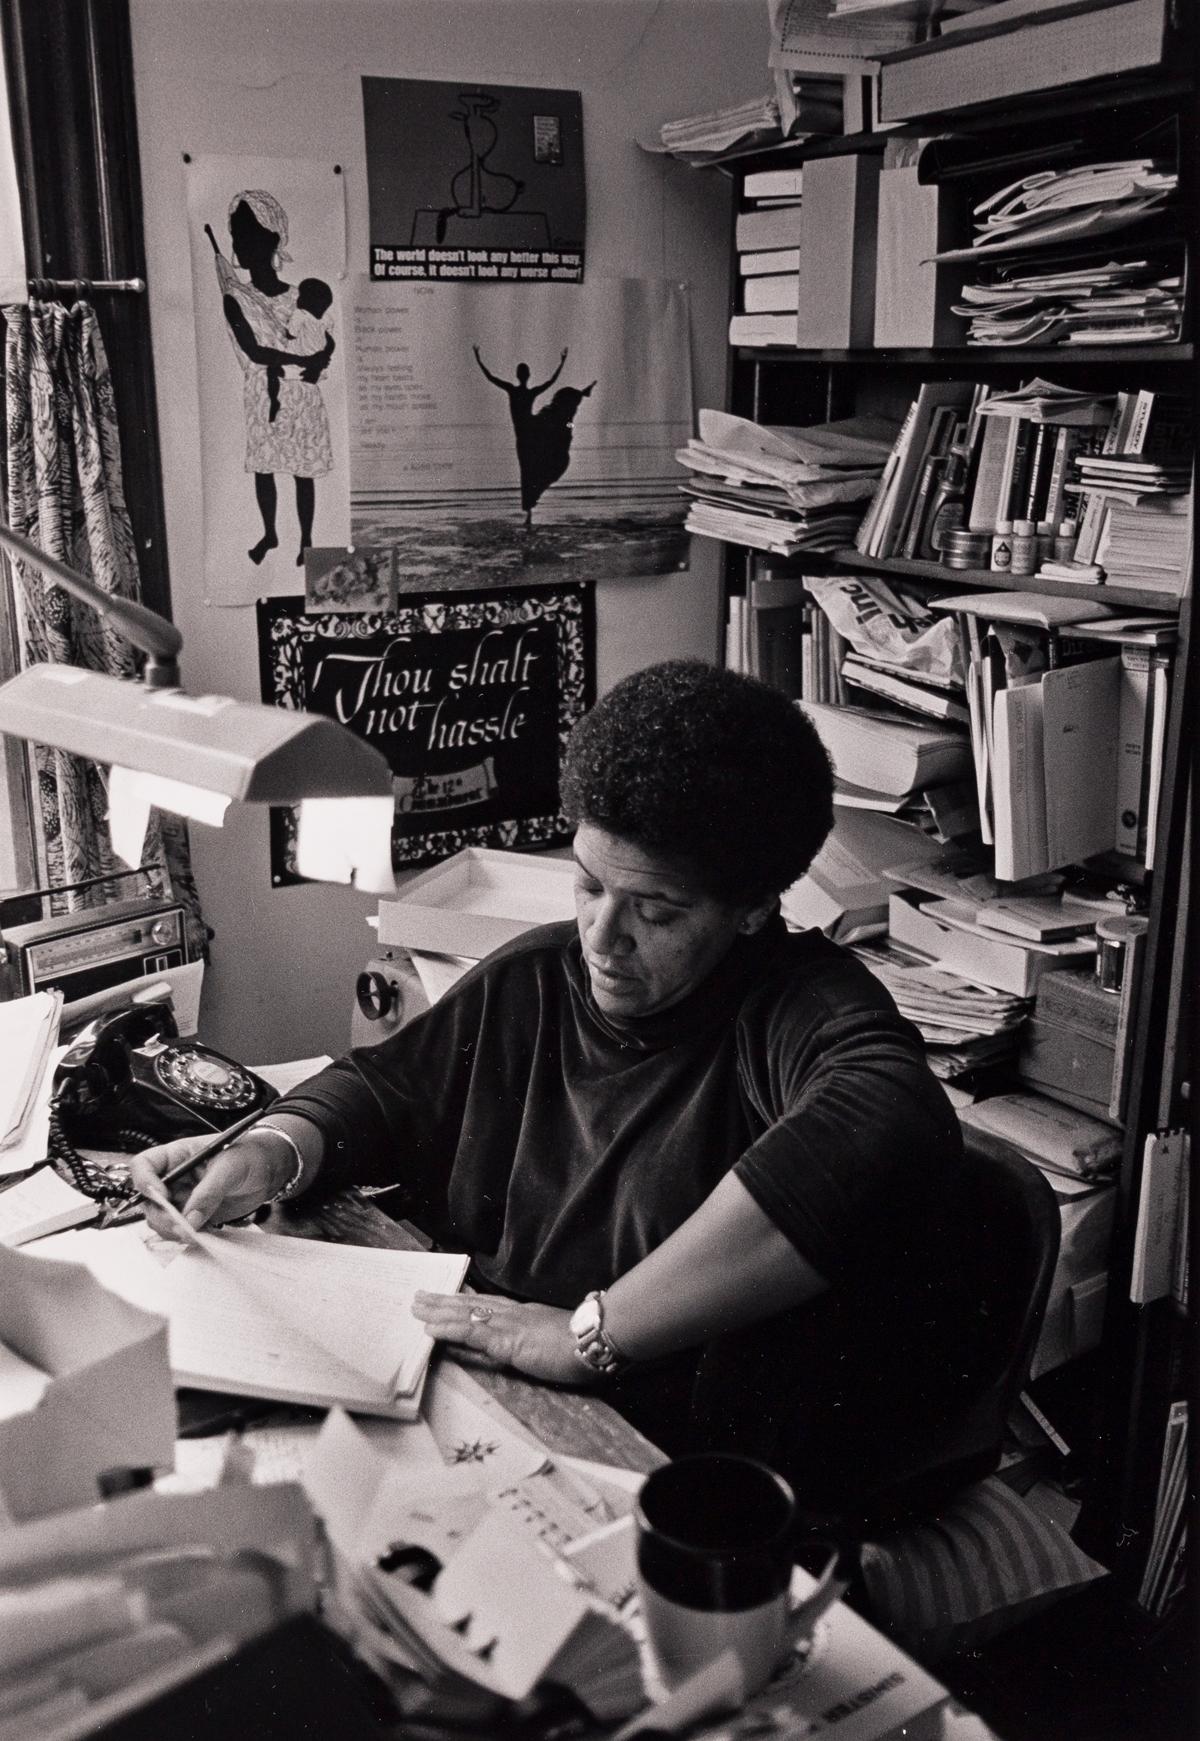 JEB (JOAN E. BIREN, 1944 - ) Audre Lorde in her home study, Staten Island, NY.